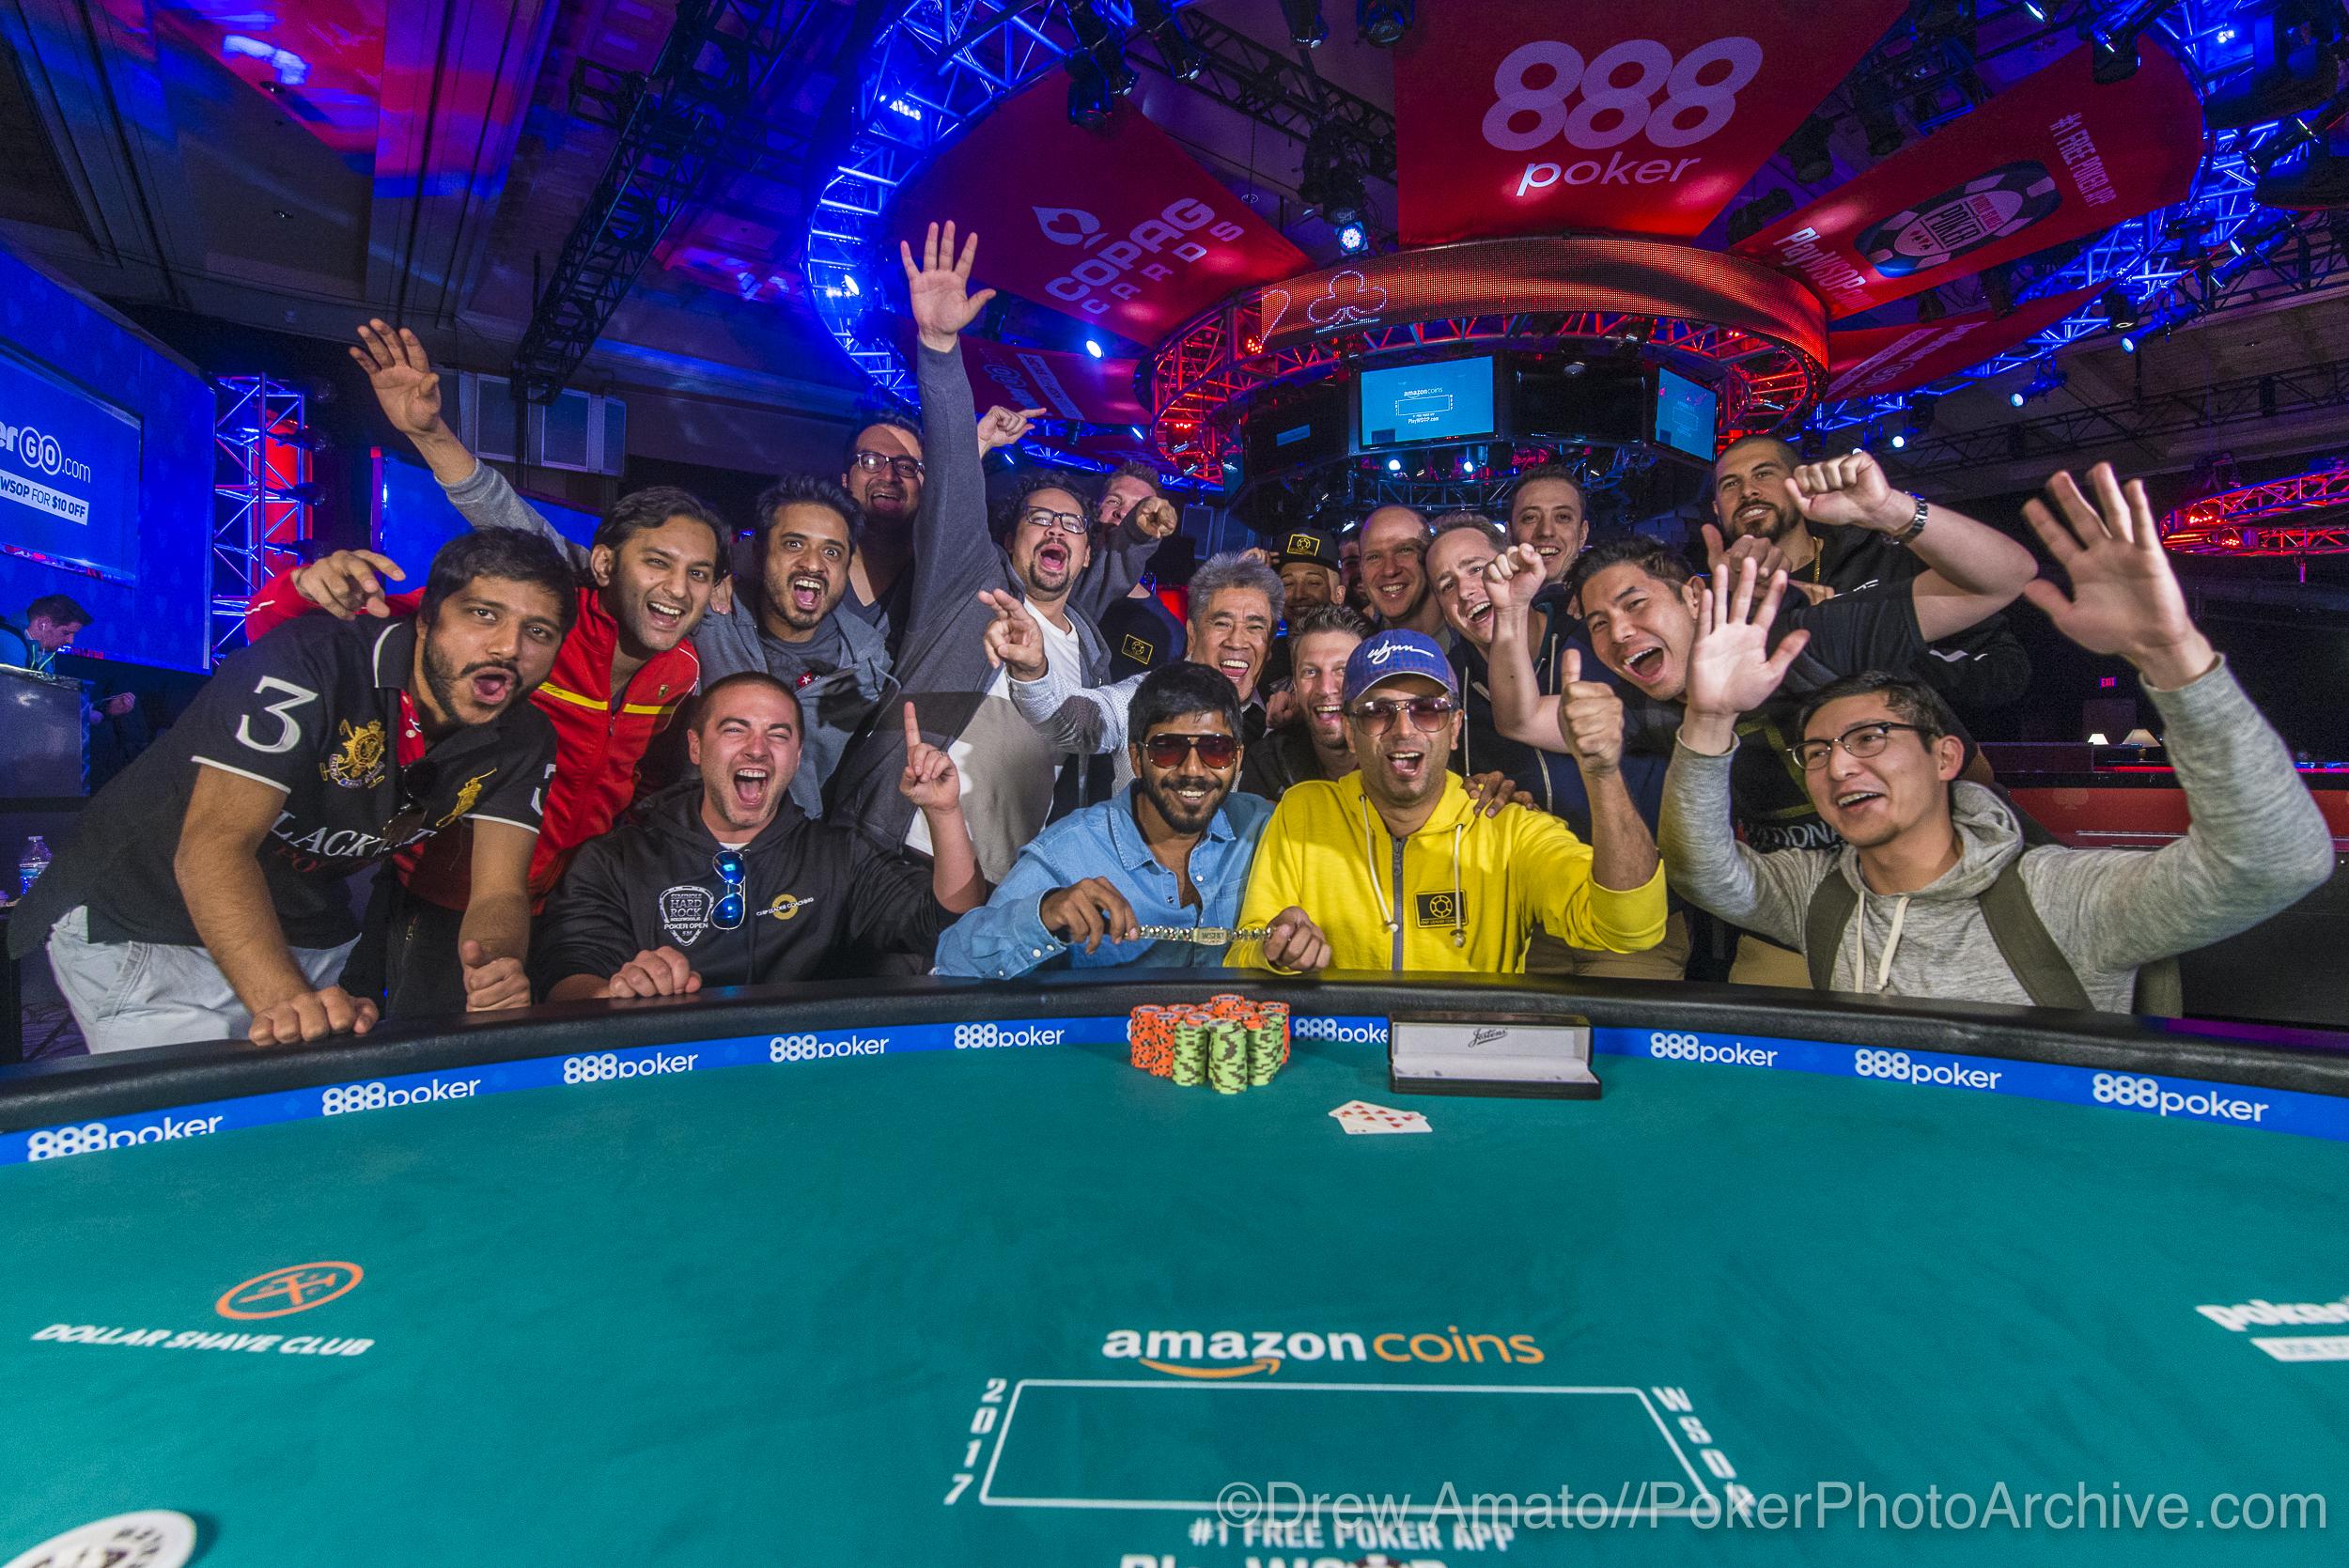 Team Aditya Sushant - Nipun Java_2017 WSOP_EV010_Day 3_Amato_DA69214.jpg